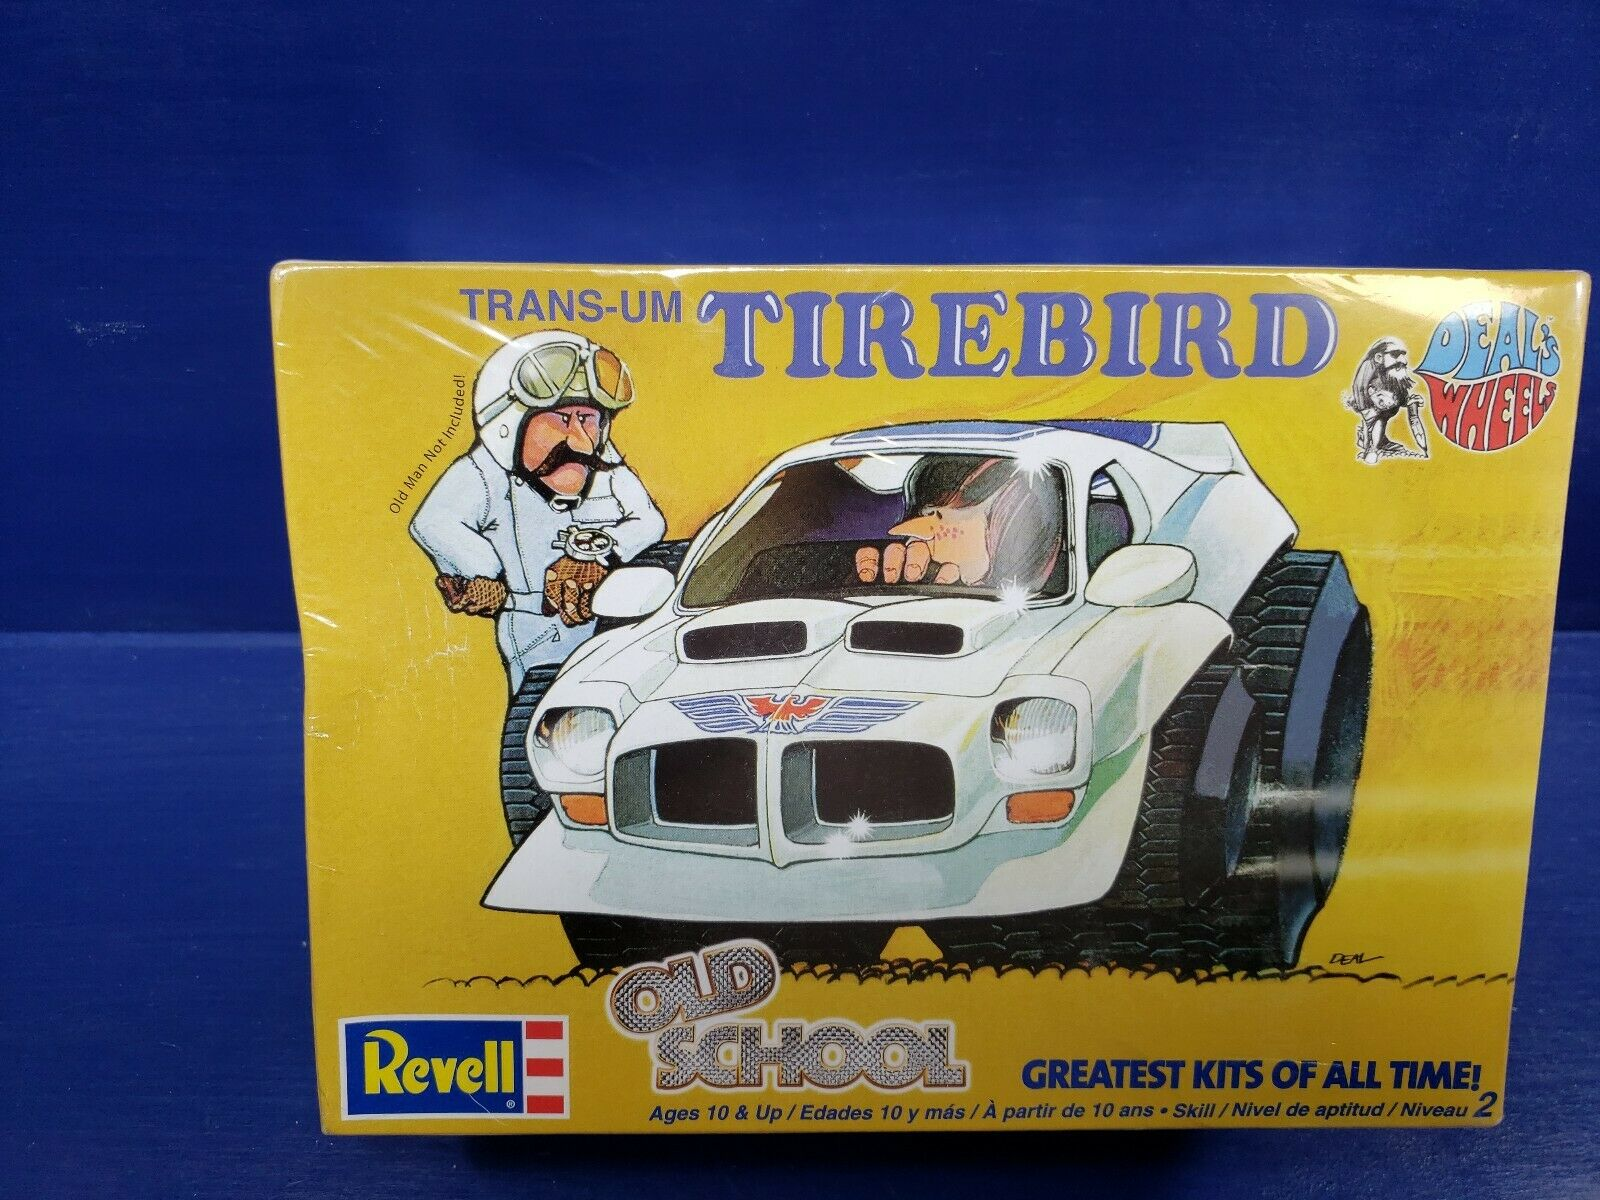 1 25 scale Trans-UM Tirebird Old School, Deal's Wheels, Revell Model Kit